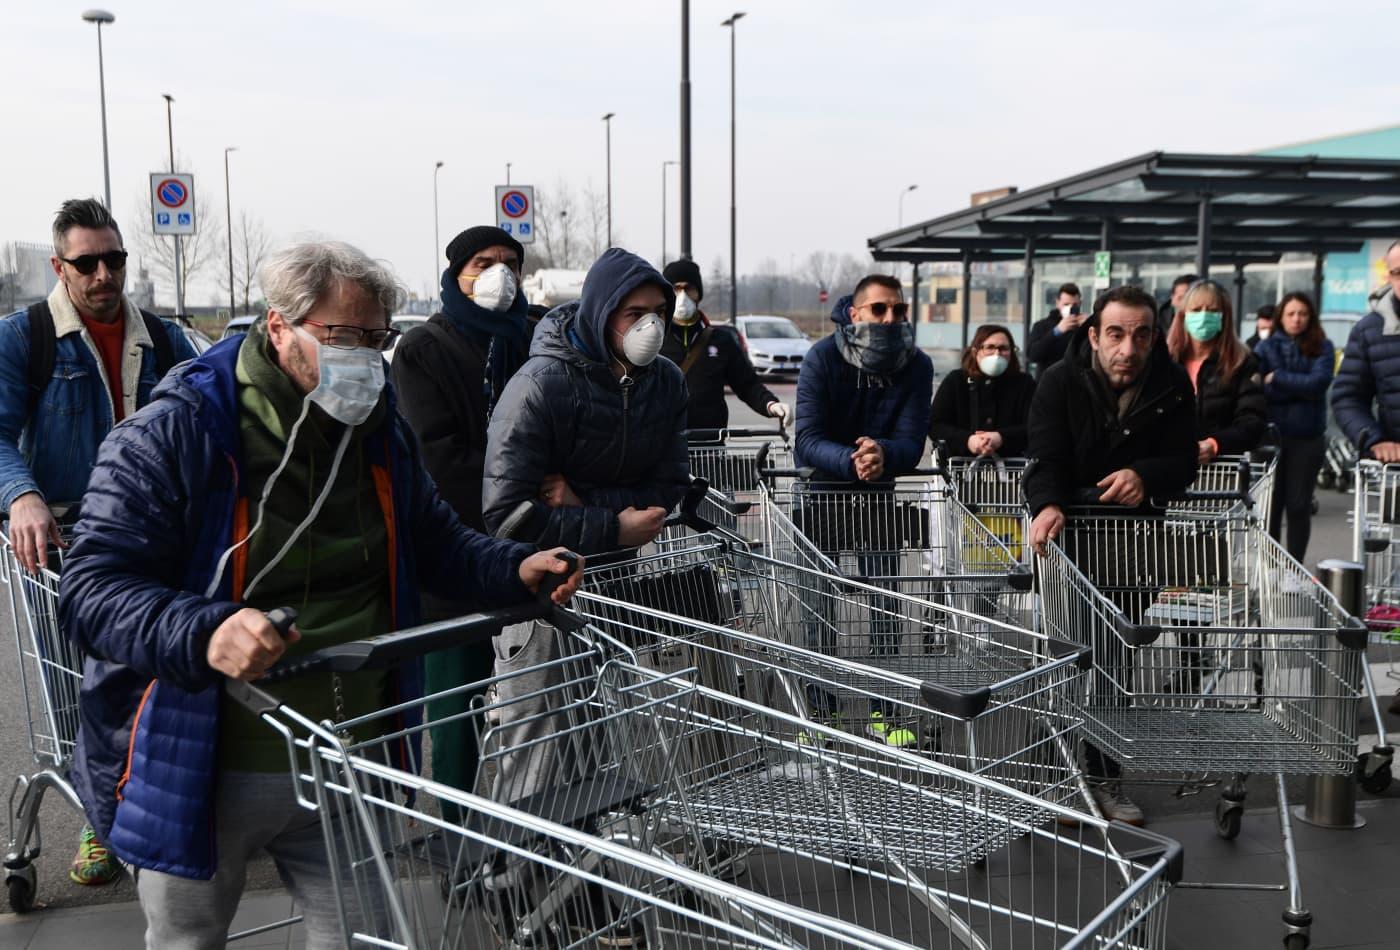 Italian stocks plunge 5.5% as coronavirus shuts down towns, schools and soccer matches